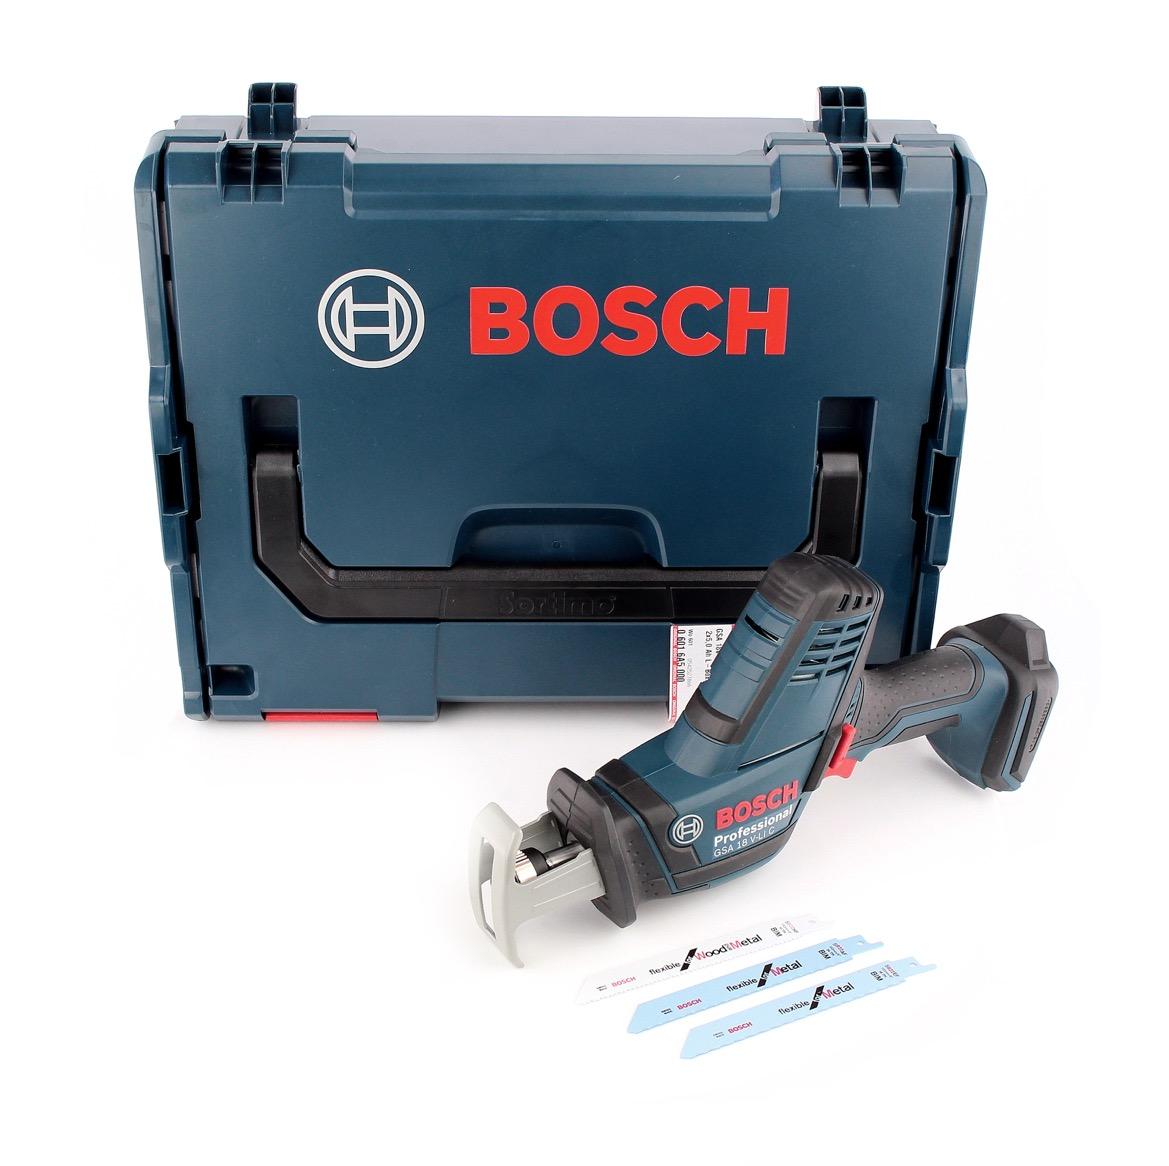 7ef733eb2be Bosch GSA 18V-Li C Akku Reciprosäge 18V ( 06016A5001 ) Säbelsäge Solo in  L-Boxx - ohne Akku, ohne Ladegerät